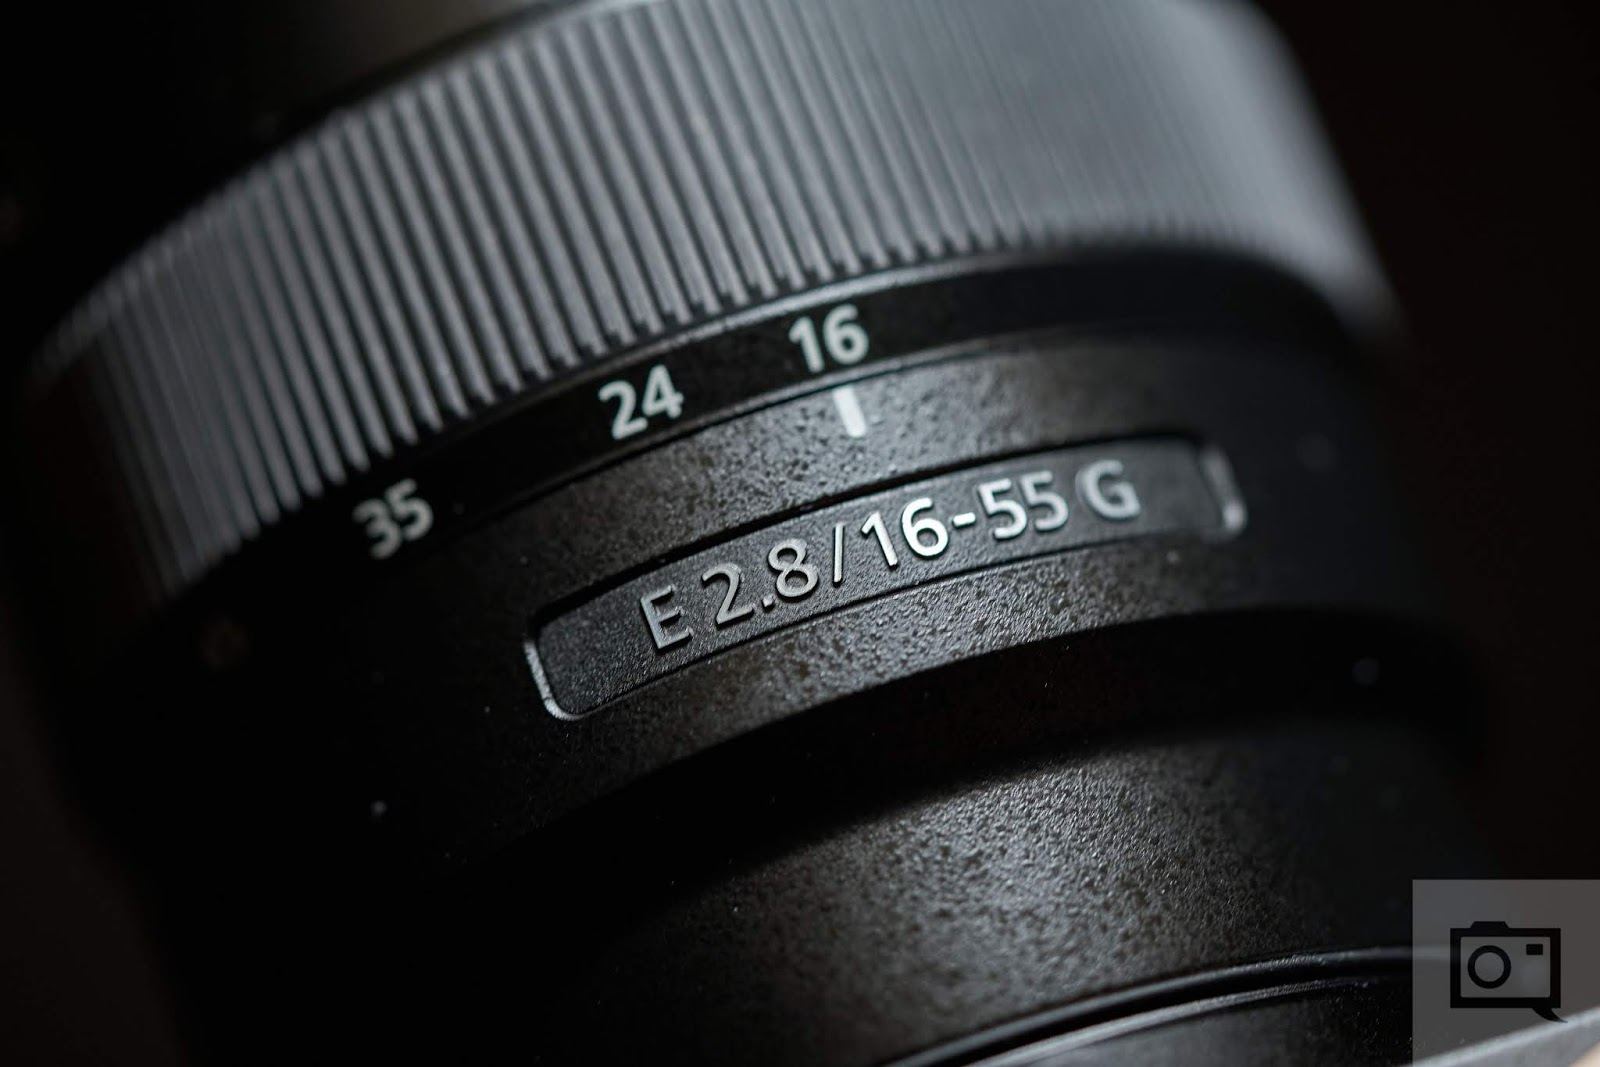 Деталь объектива Sony E 16-55mm f/2.8 G